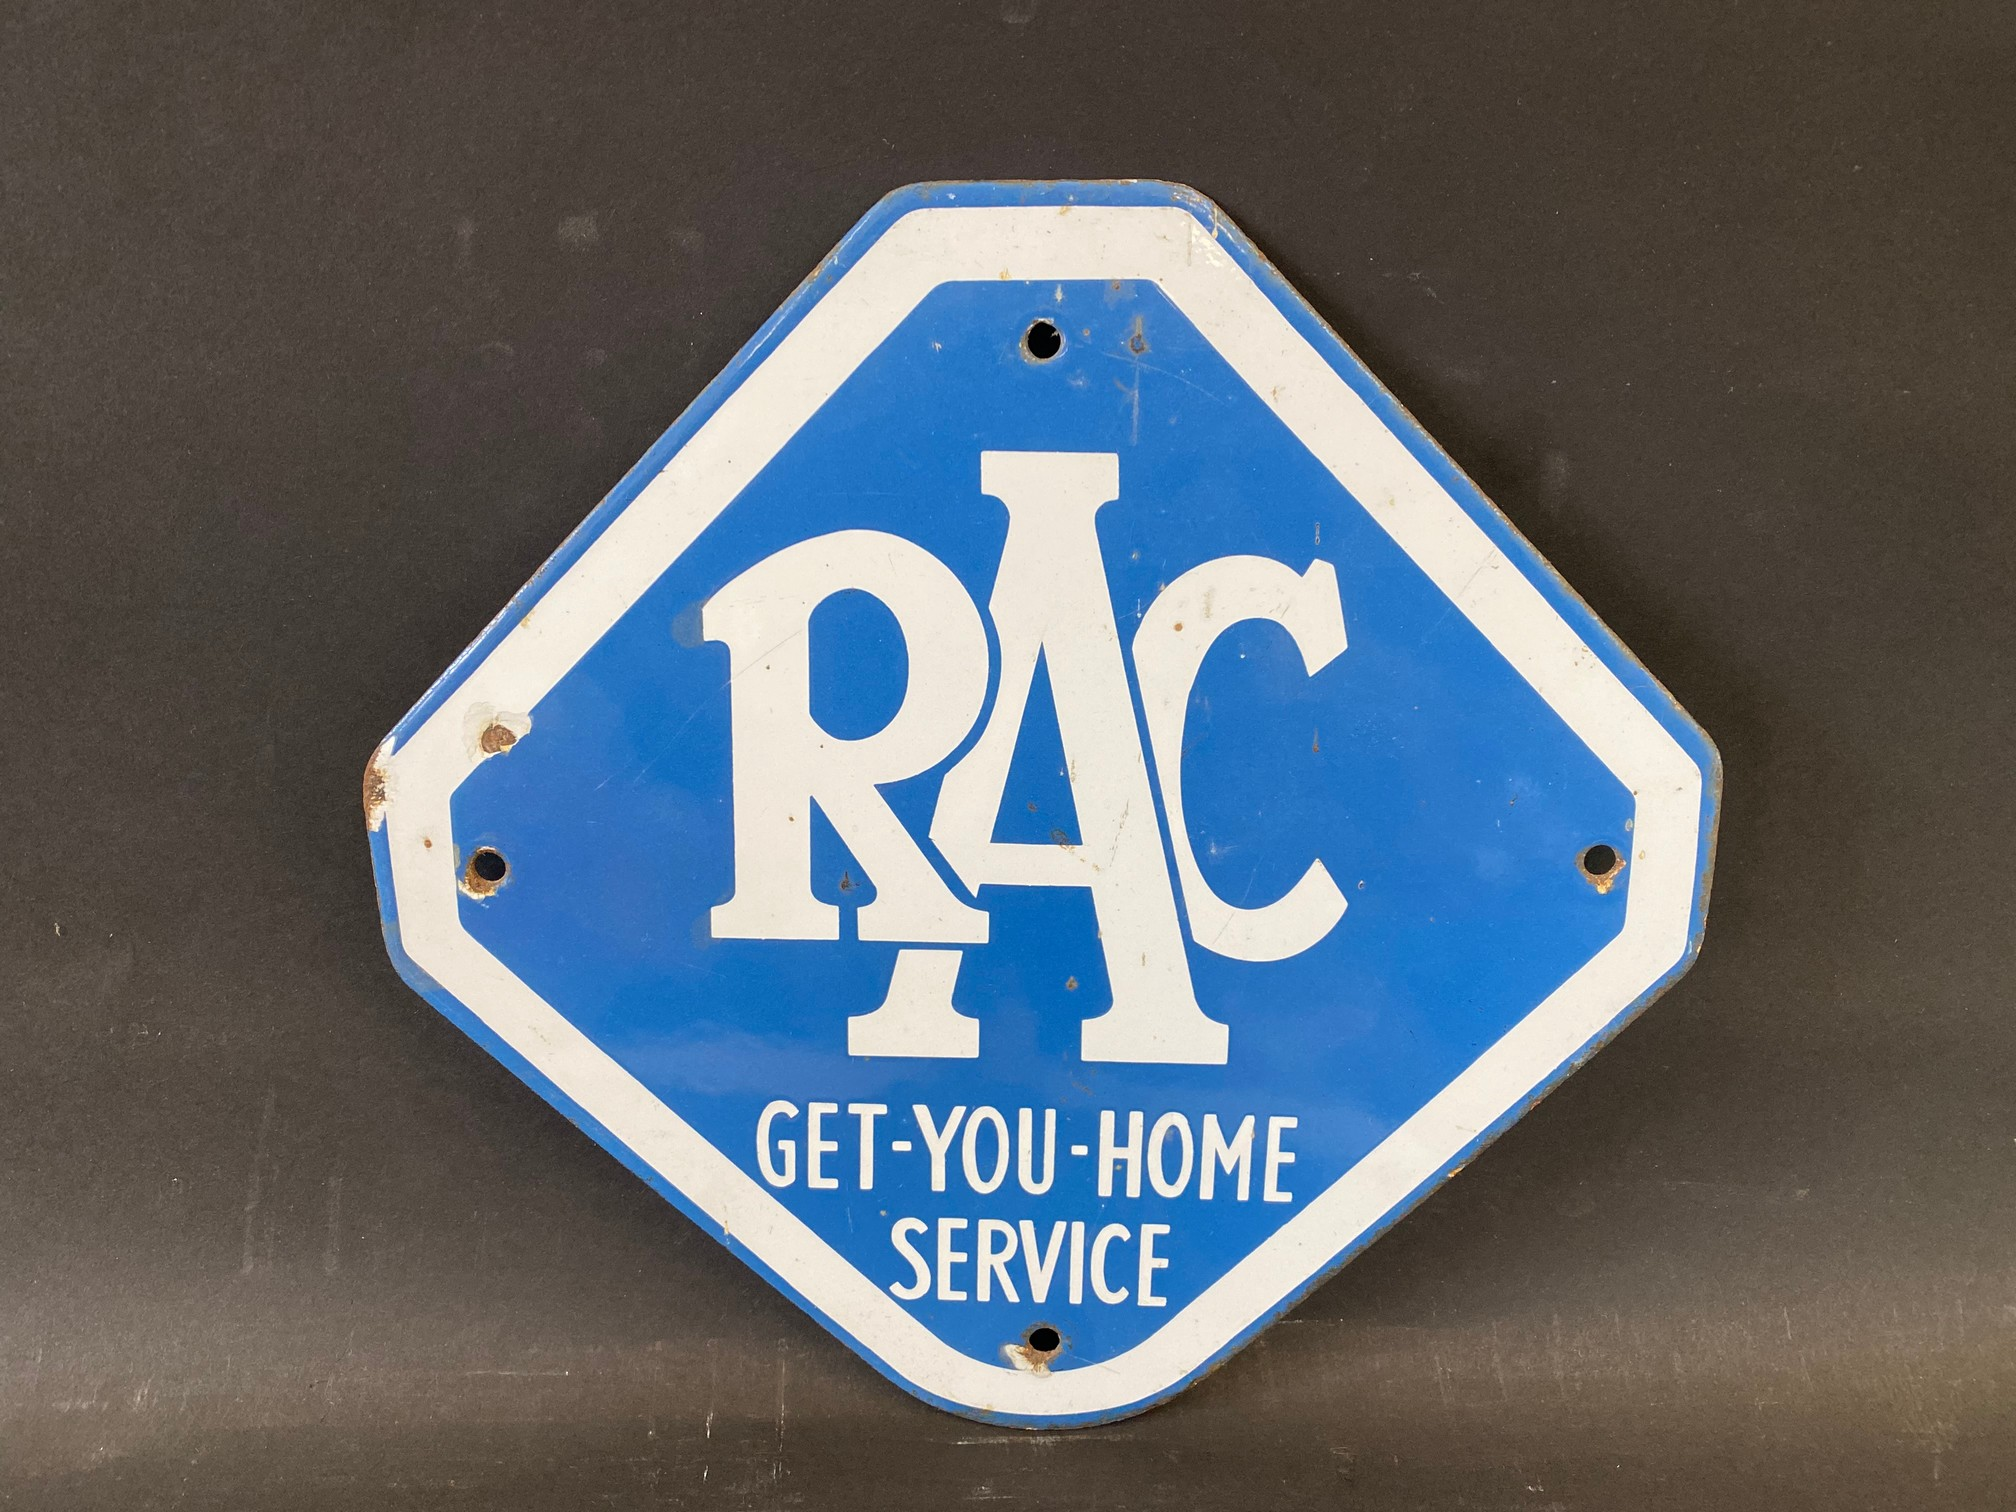 "An RAC Get-You-Home Service lozenge shaped enamel sign, 10 1/2 x 10""."